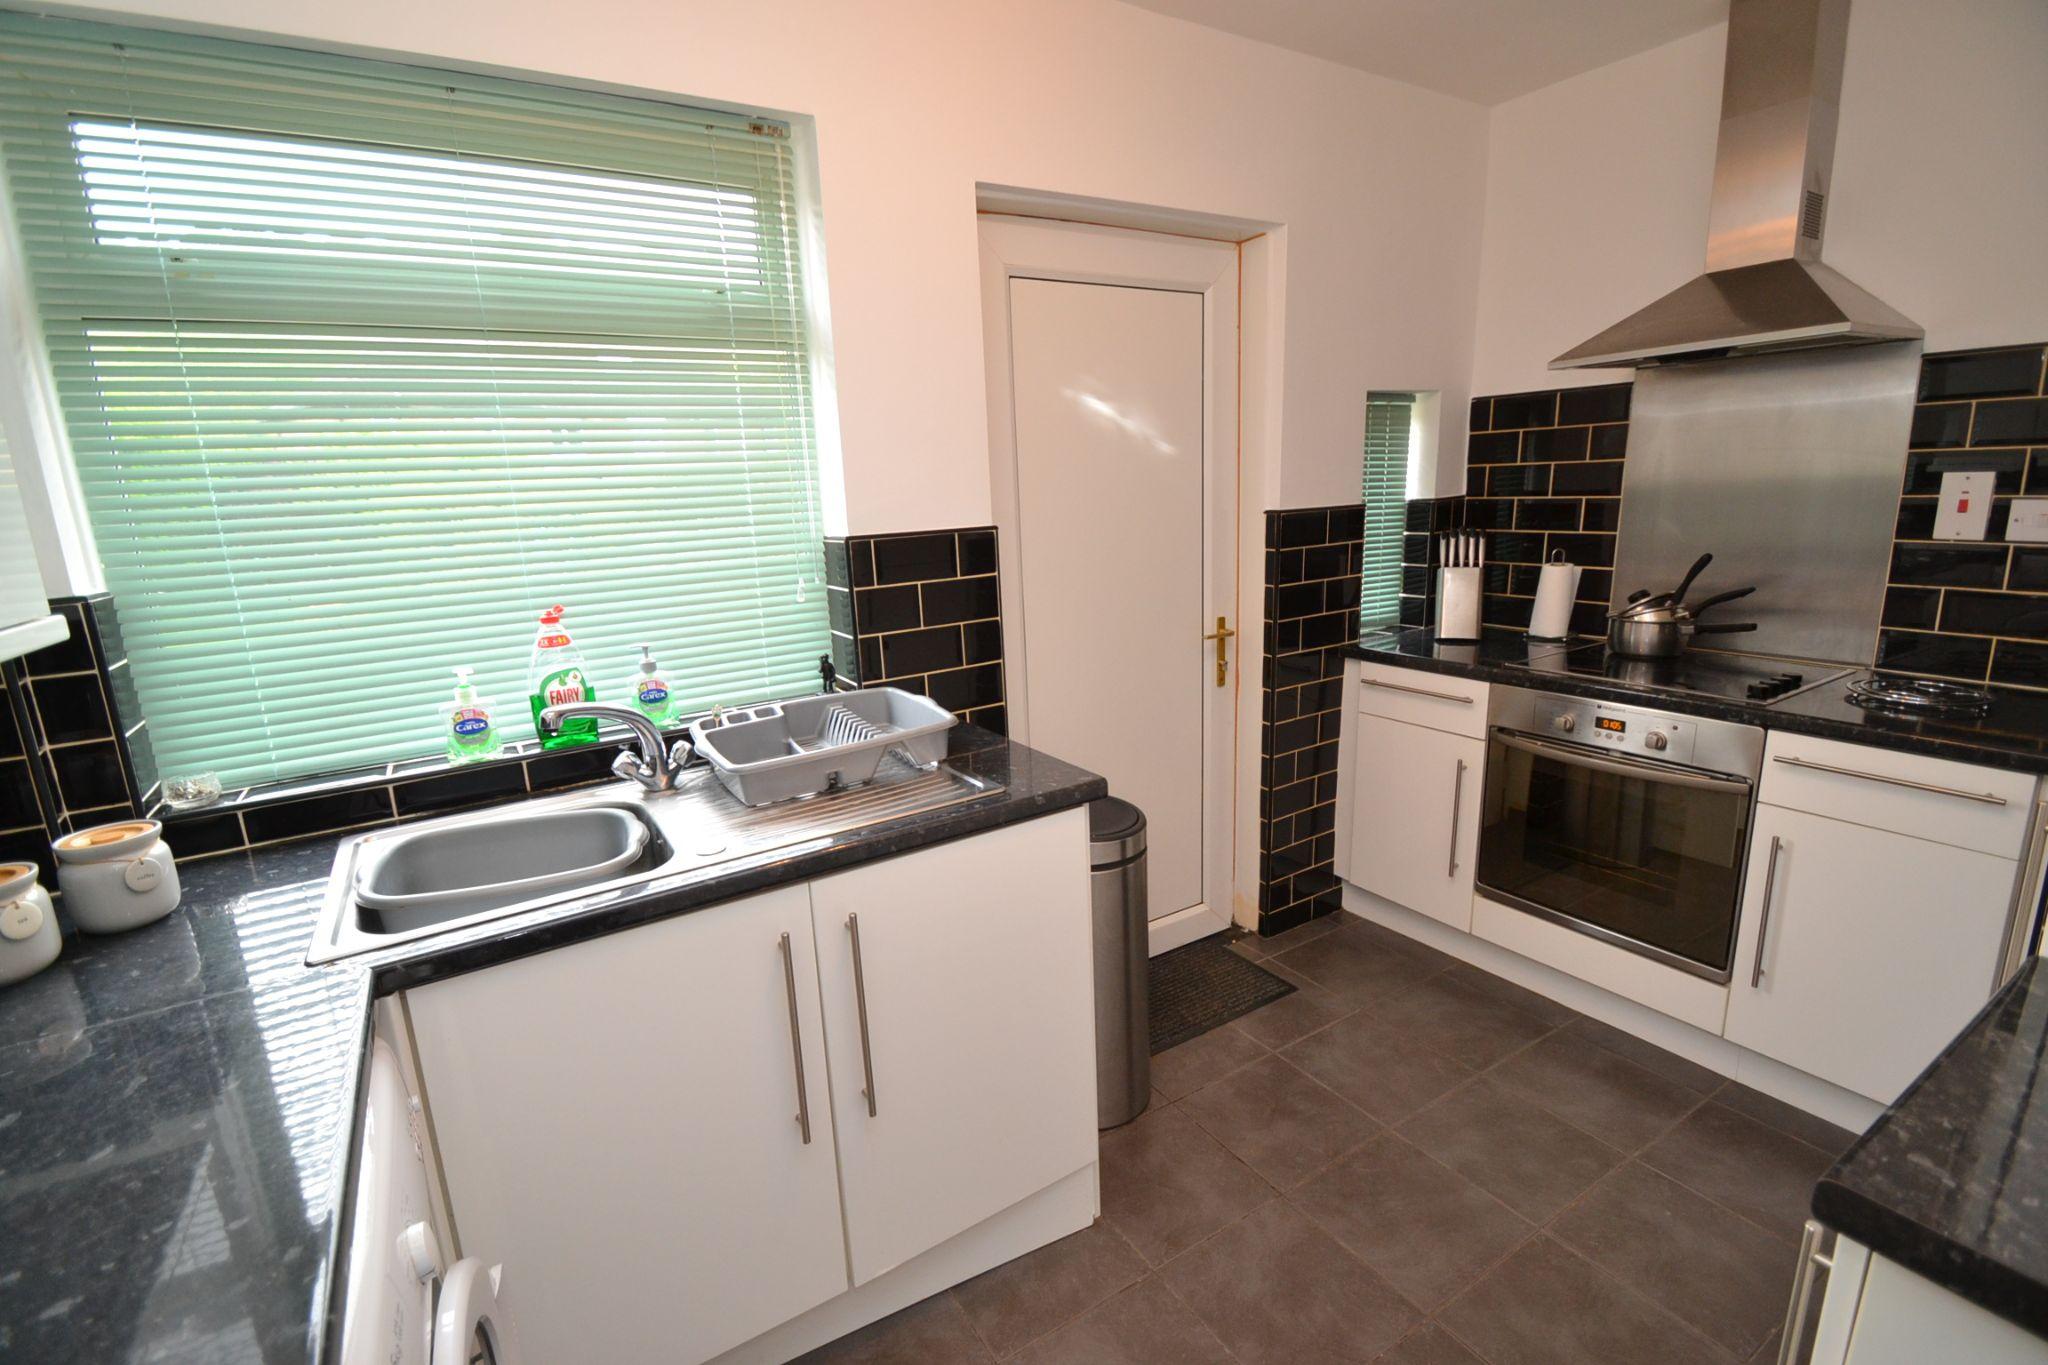 1 Bedroom Ground Floor Maisonette Flat/apartment For Sale - Photograph 3